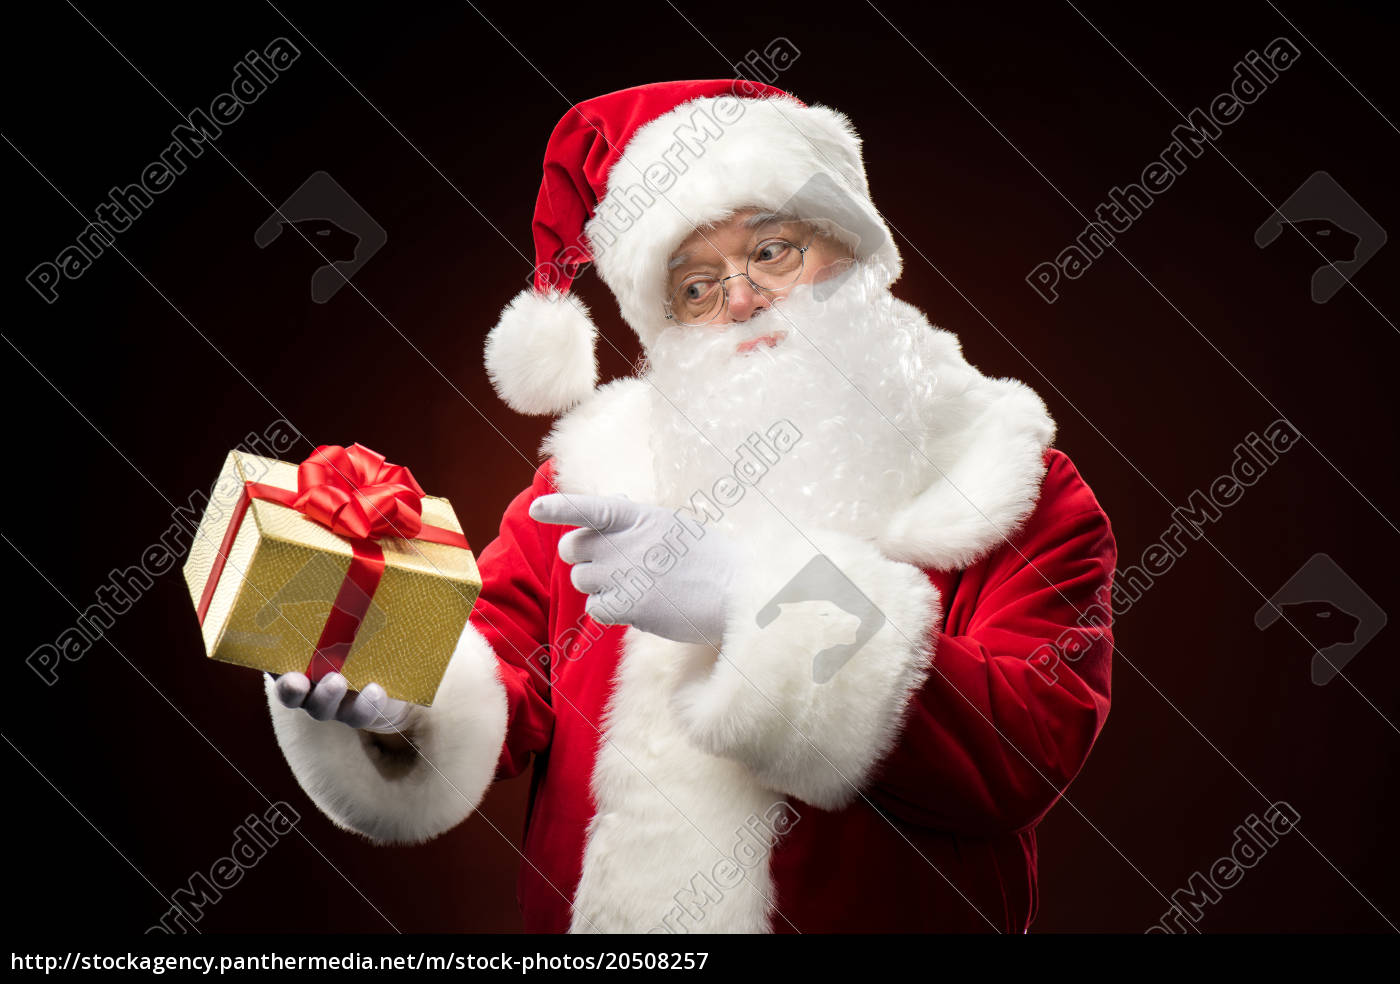 santa, claus, pointing, on, gift, box - 20508257